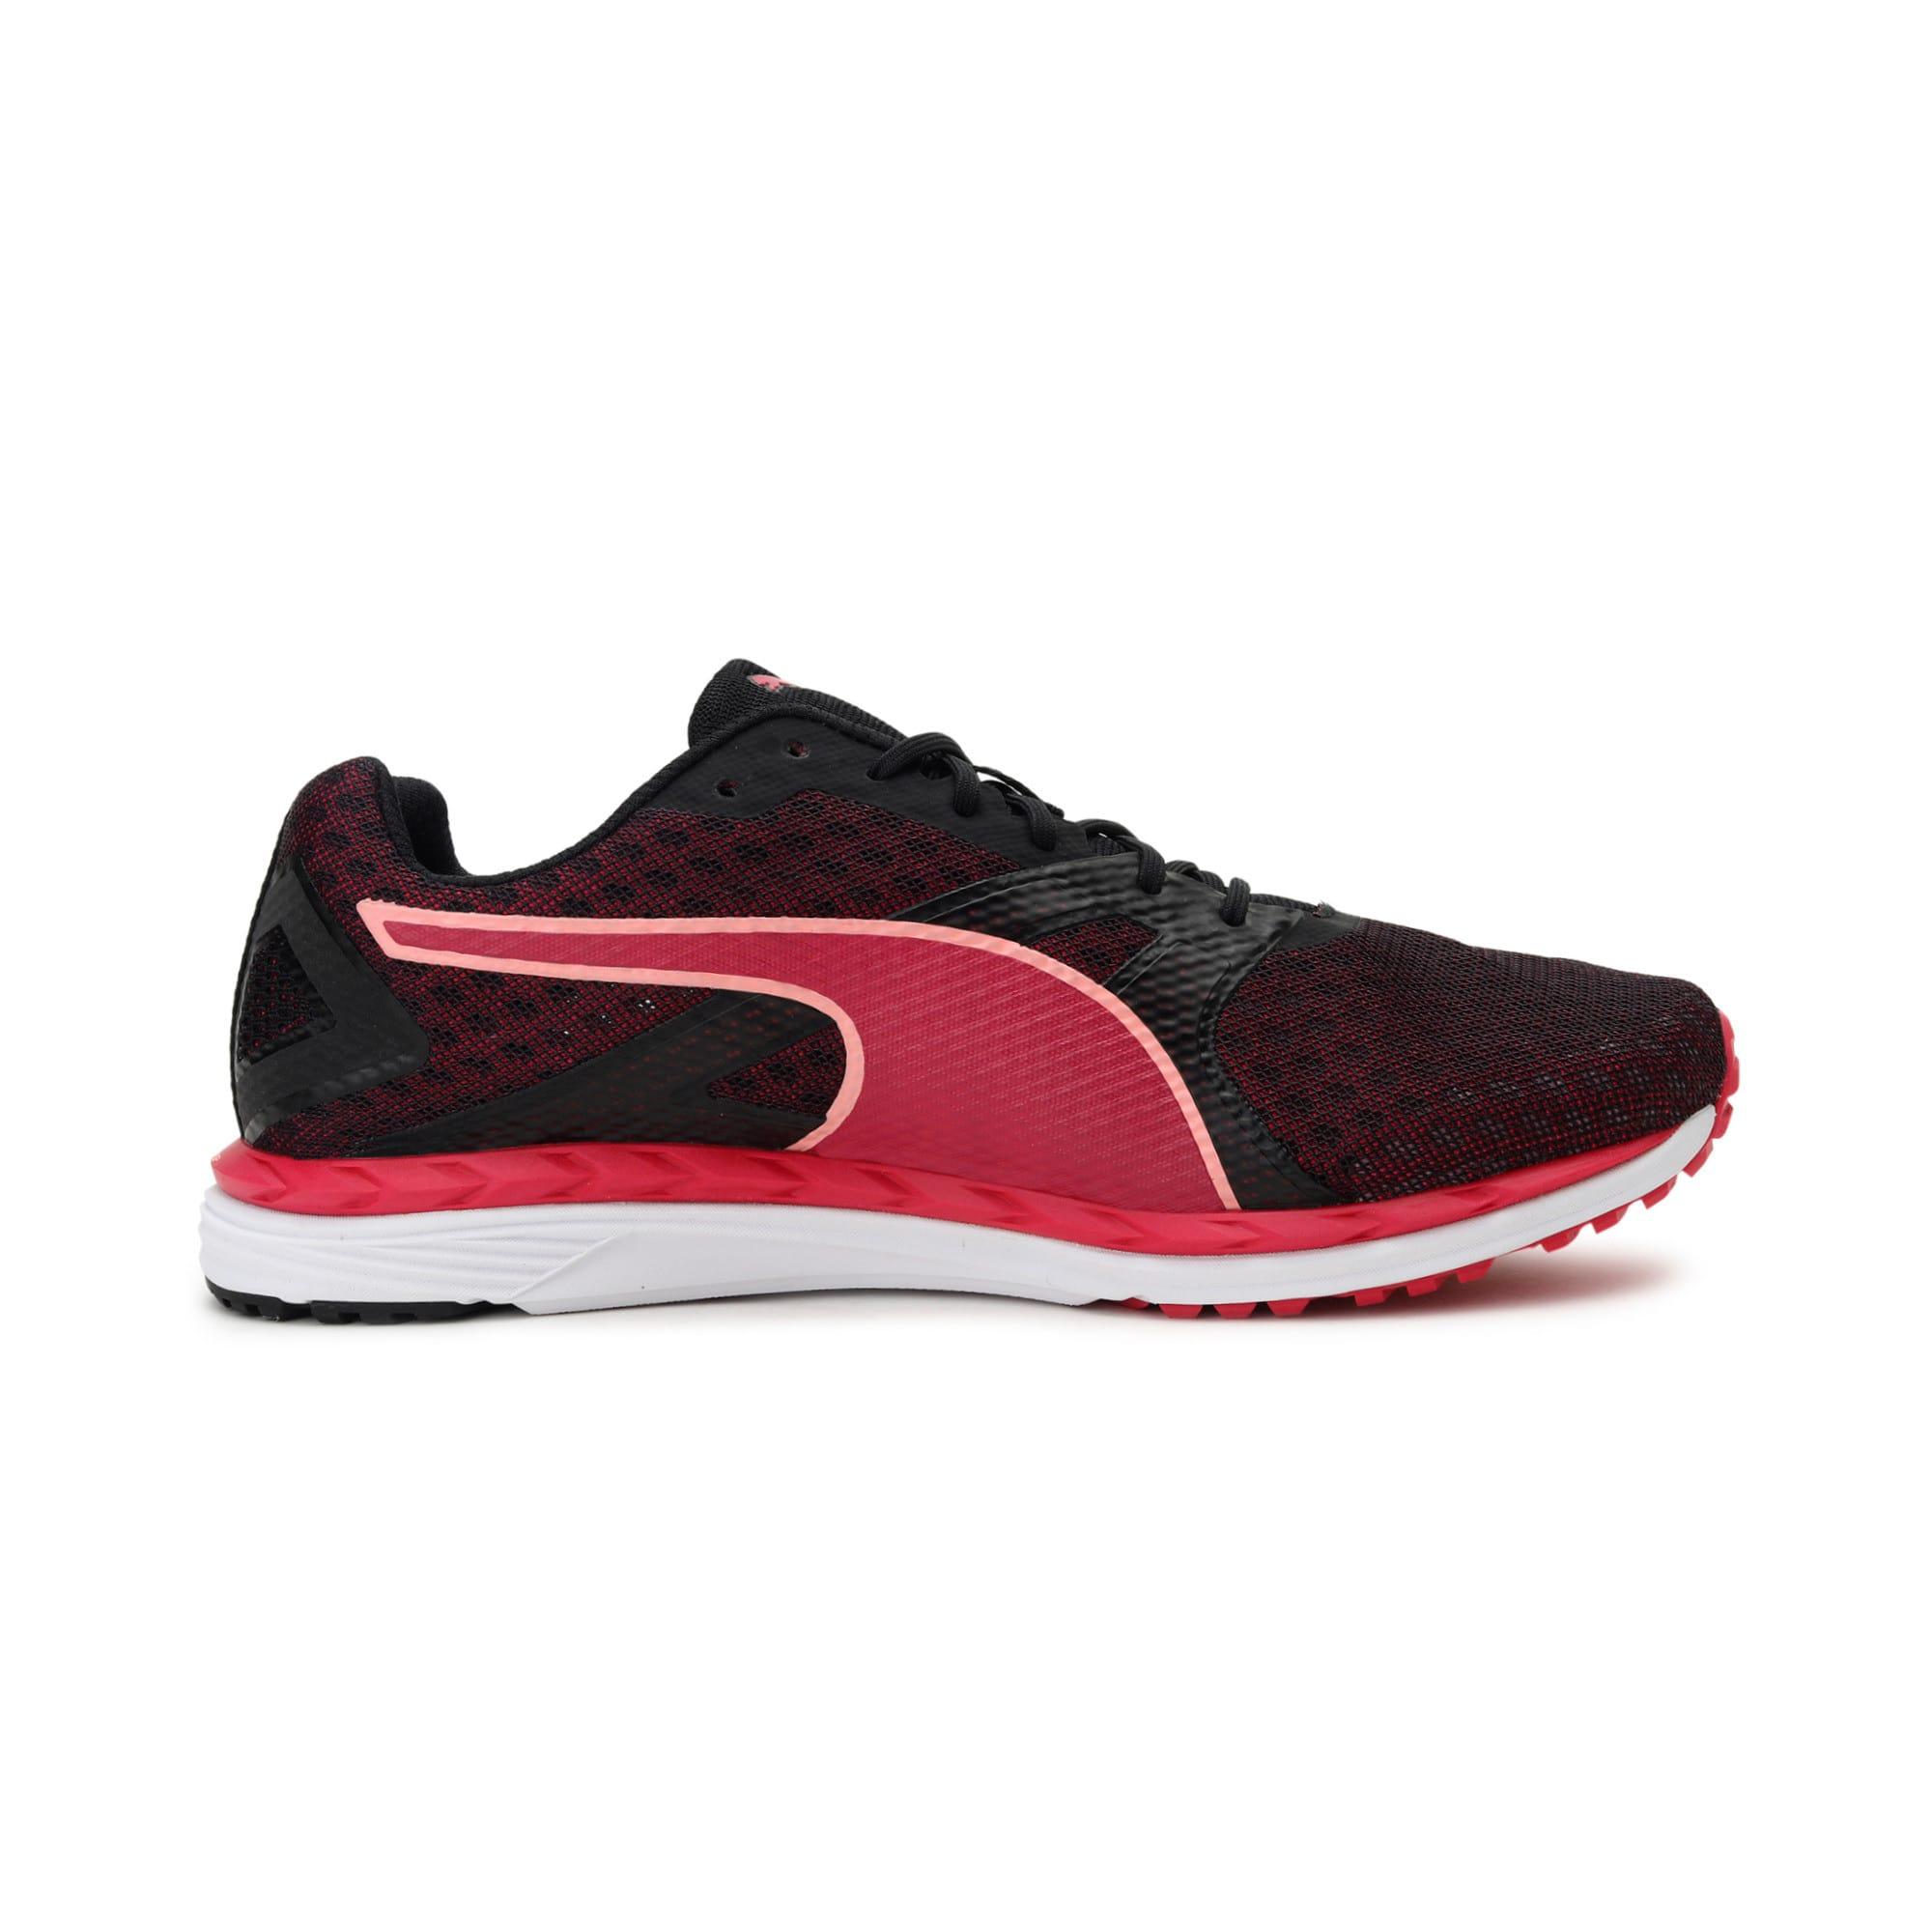 Thumbnail 5 of Speed 300 IGNITE 2 Women's Running Shoes, Love Potion-Puma Black, medium-IND